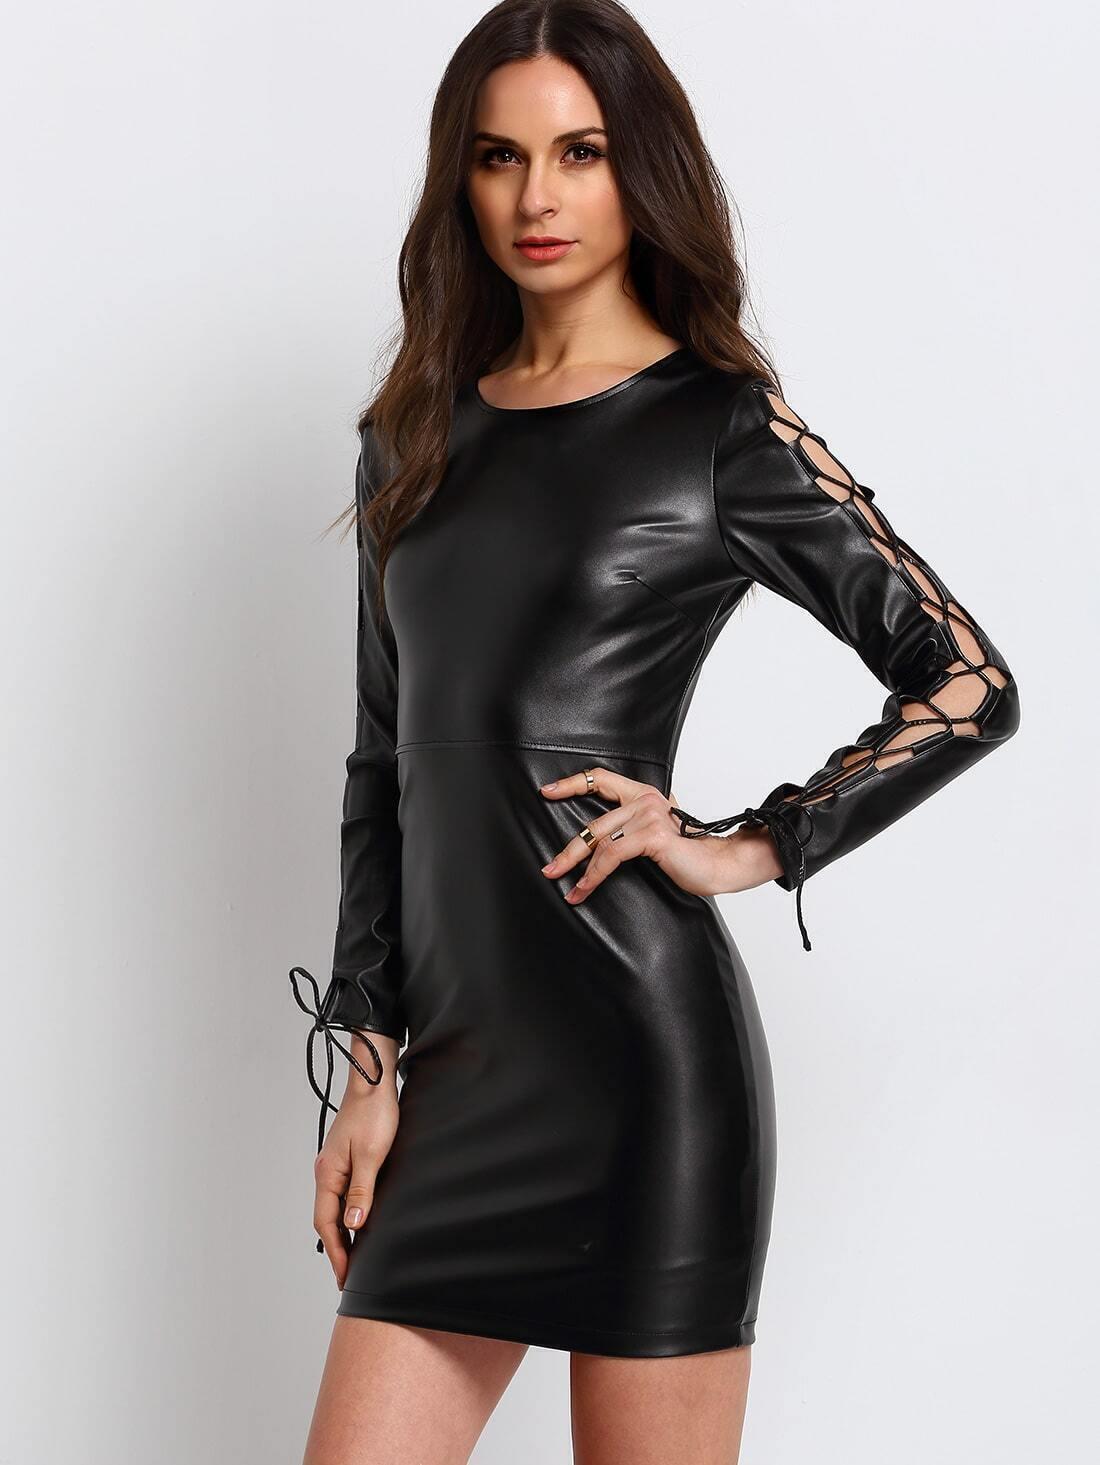 robe en simili cuir manches lacees noir french romwe With robe en cuir noir